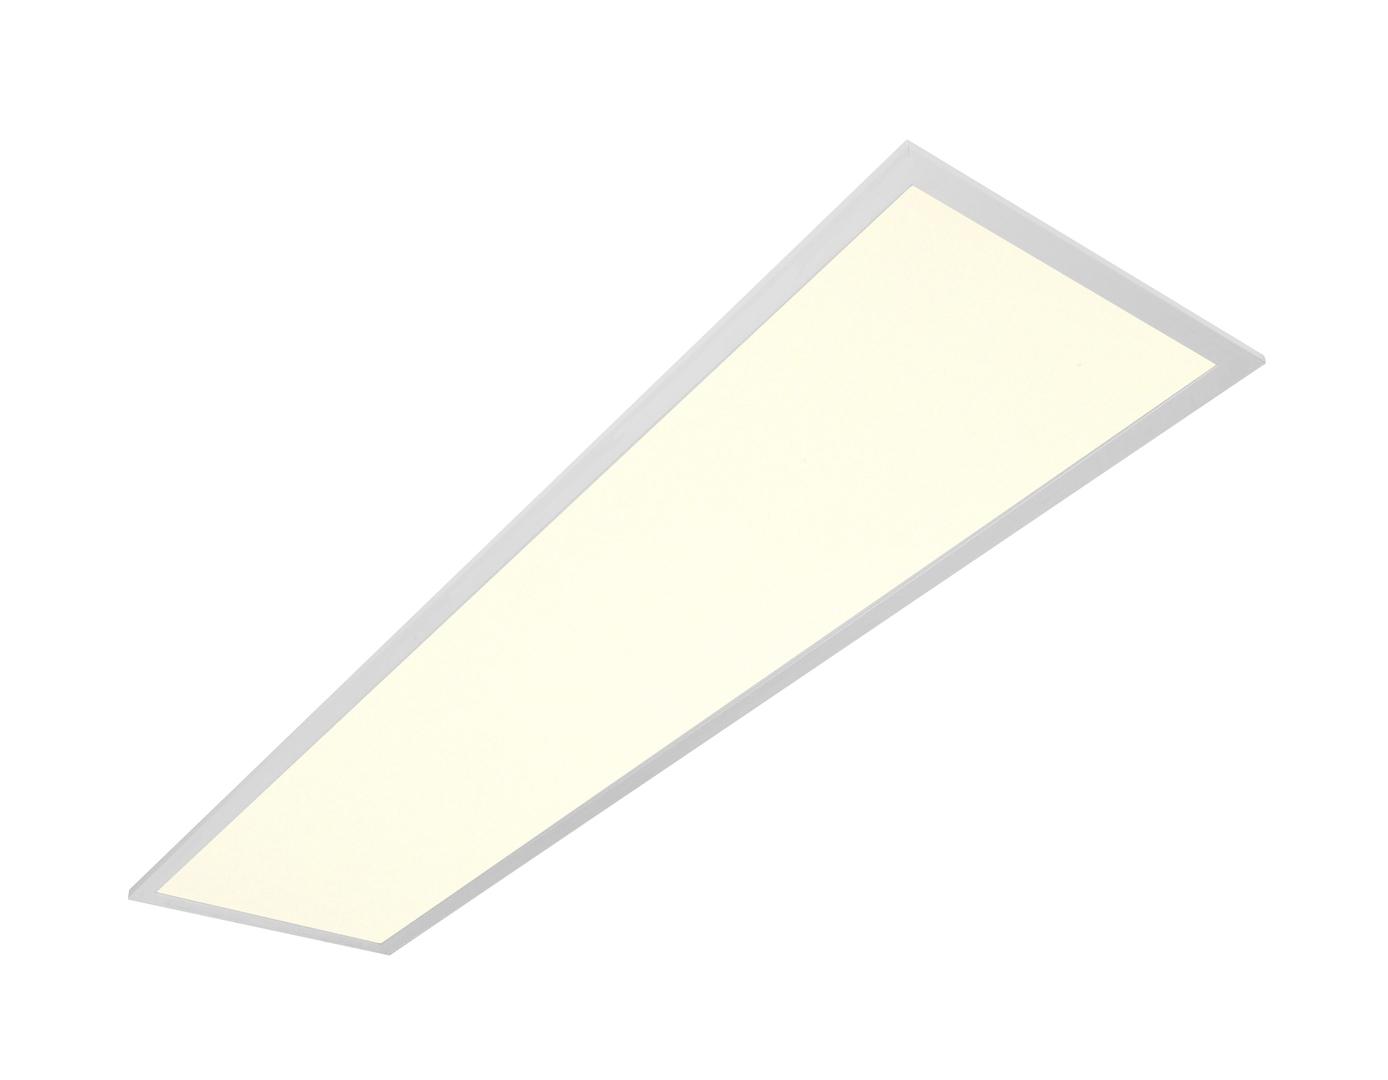 LED panel white rectangle 40W 230V IP20 4000K - Natural Light Color